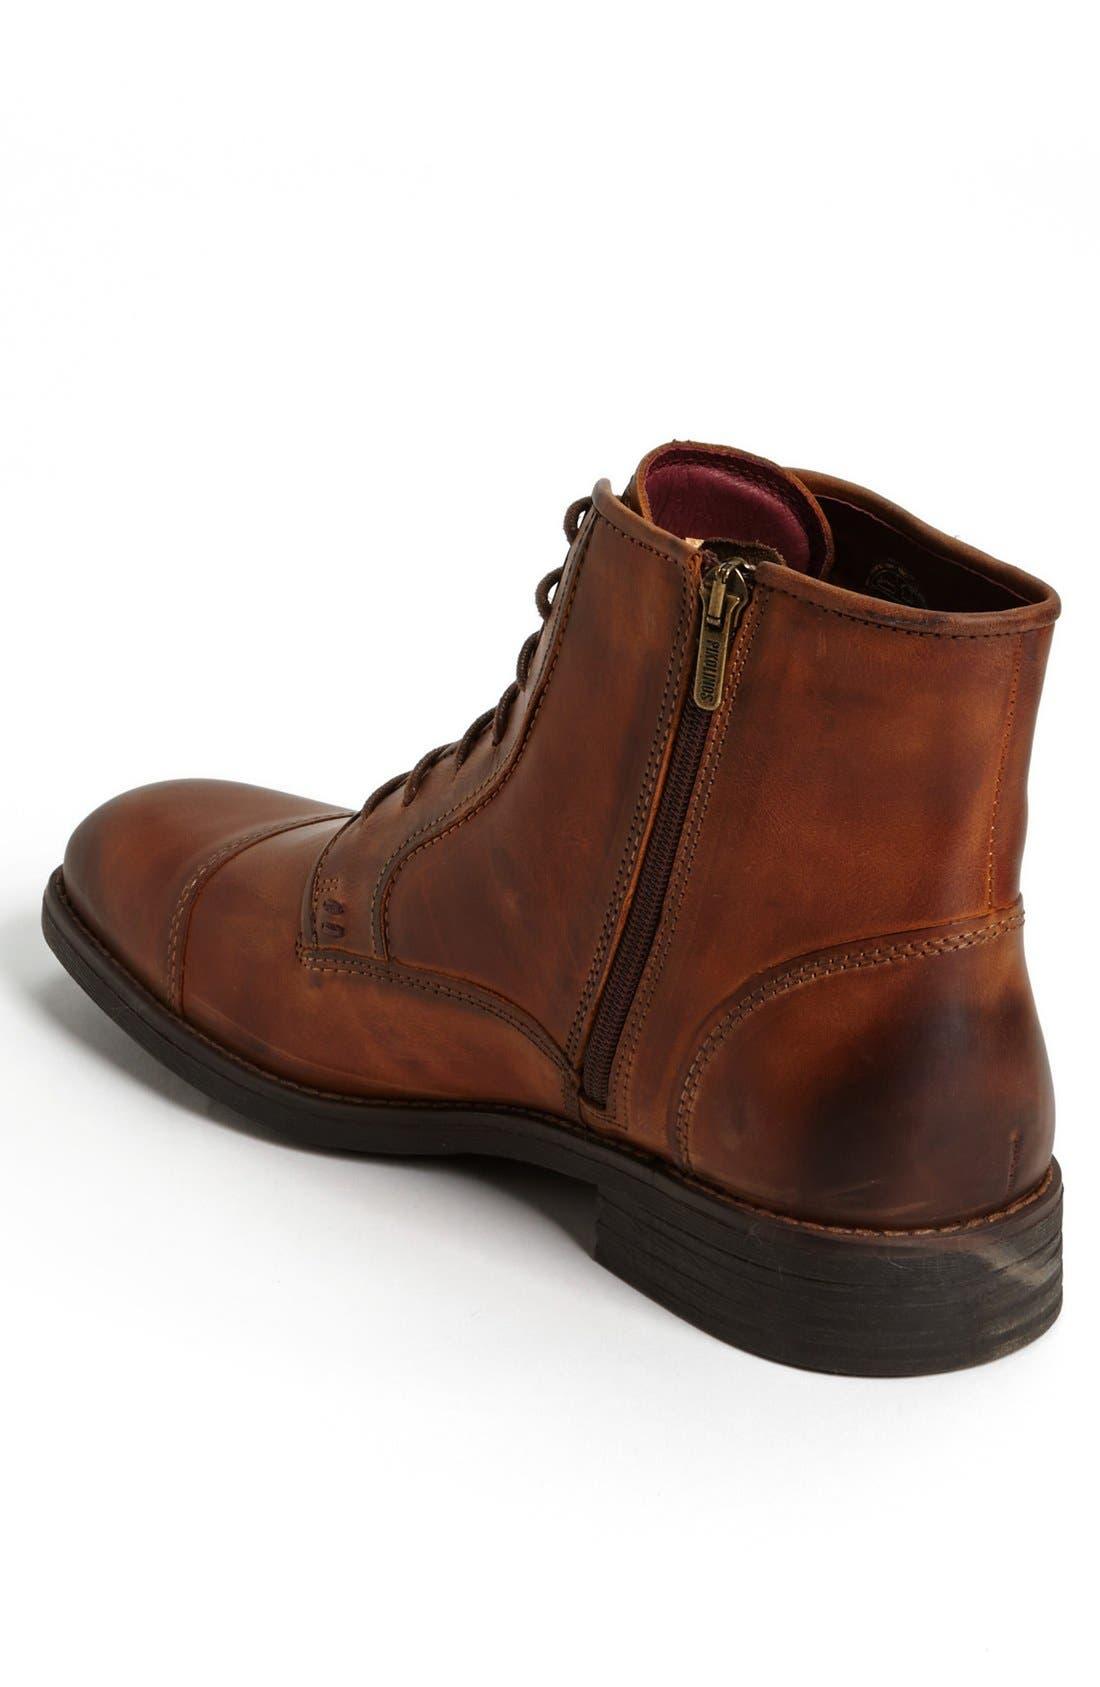 Alternate Image 2  - PIKOLINOS 'Pamplona' Cap Toe Boot